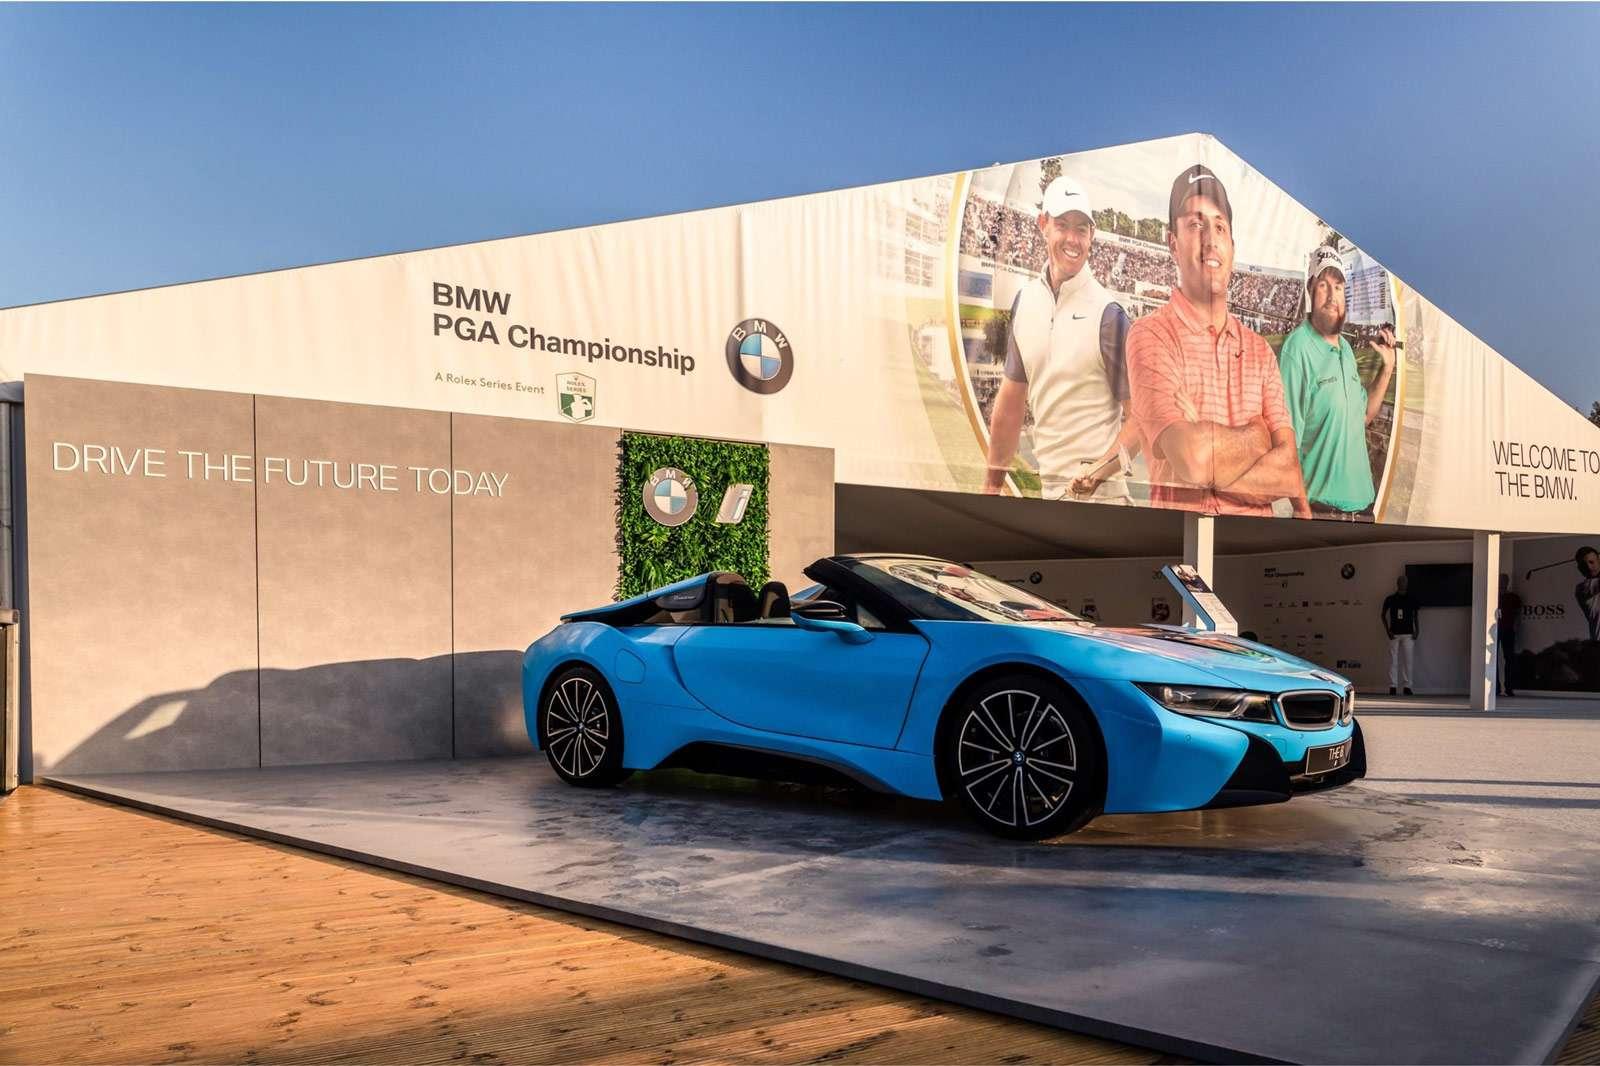 blue BMW soft-top sports car displayed at PGA Championship